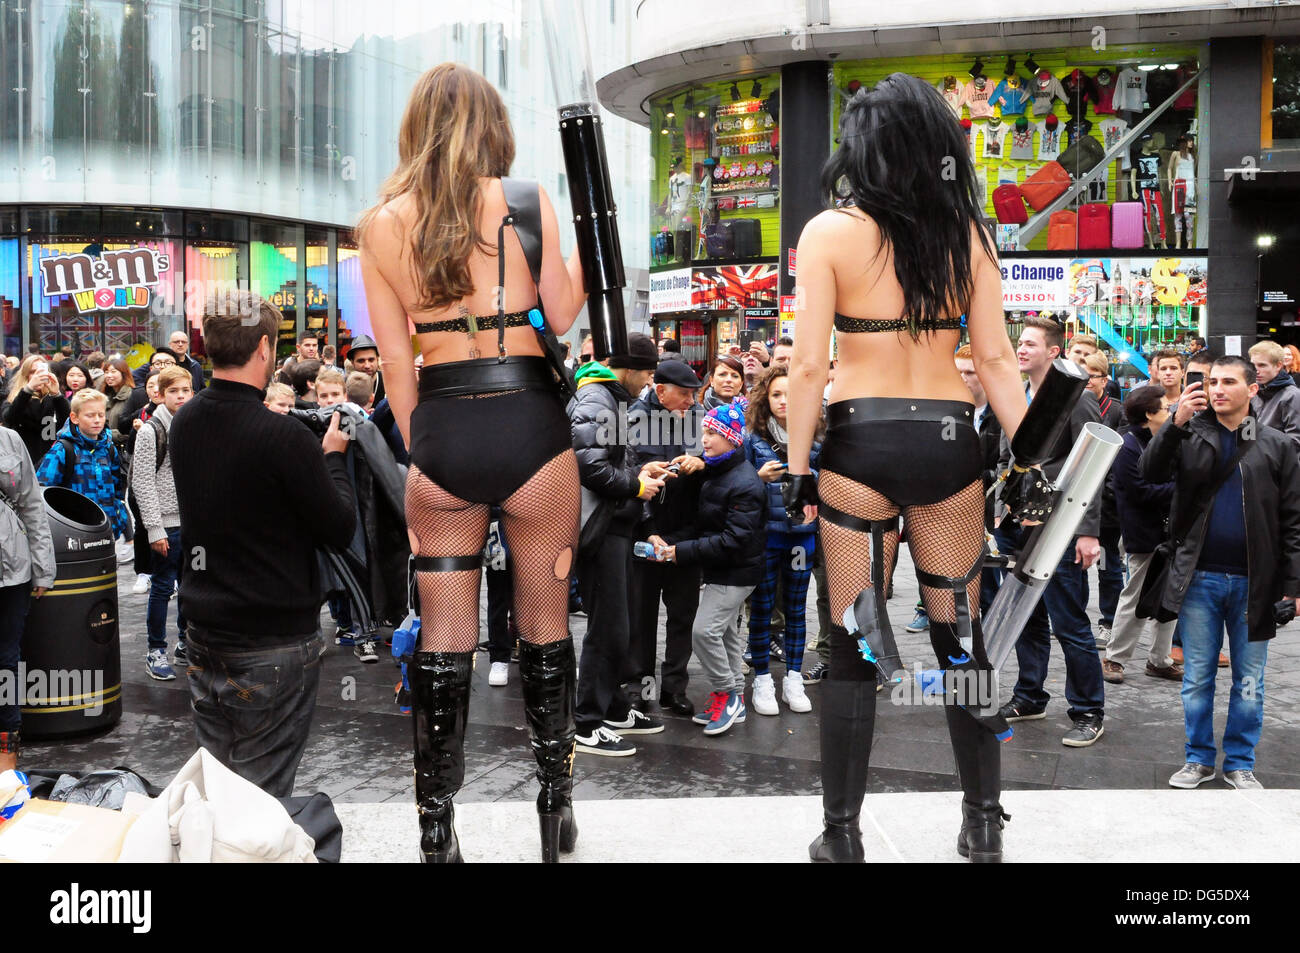 Celebrity Scarlet Bouvier naked (67 foto and video), Ass, Bikini, Boobs, legs 2017